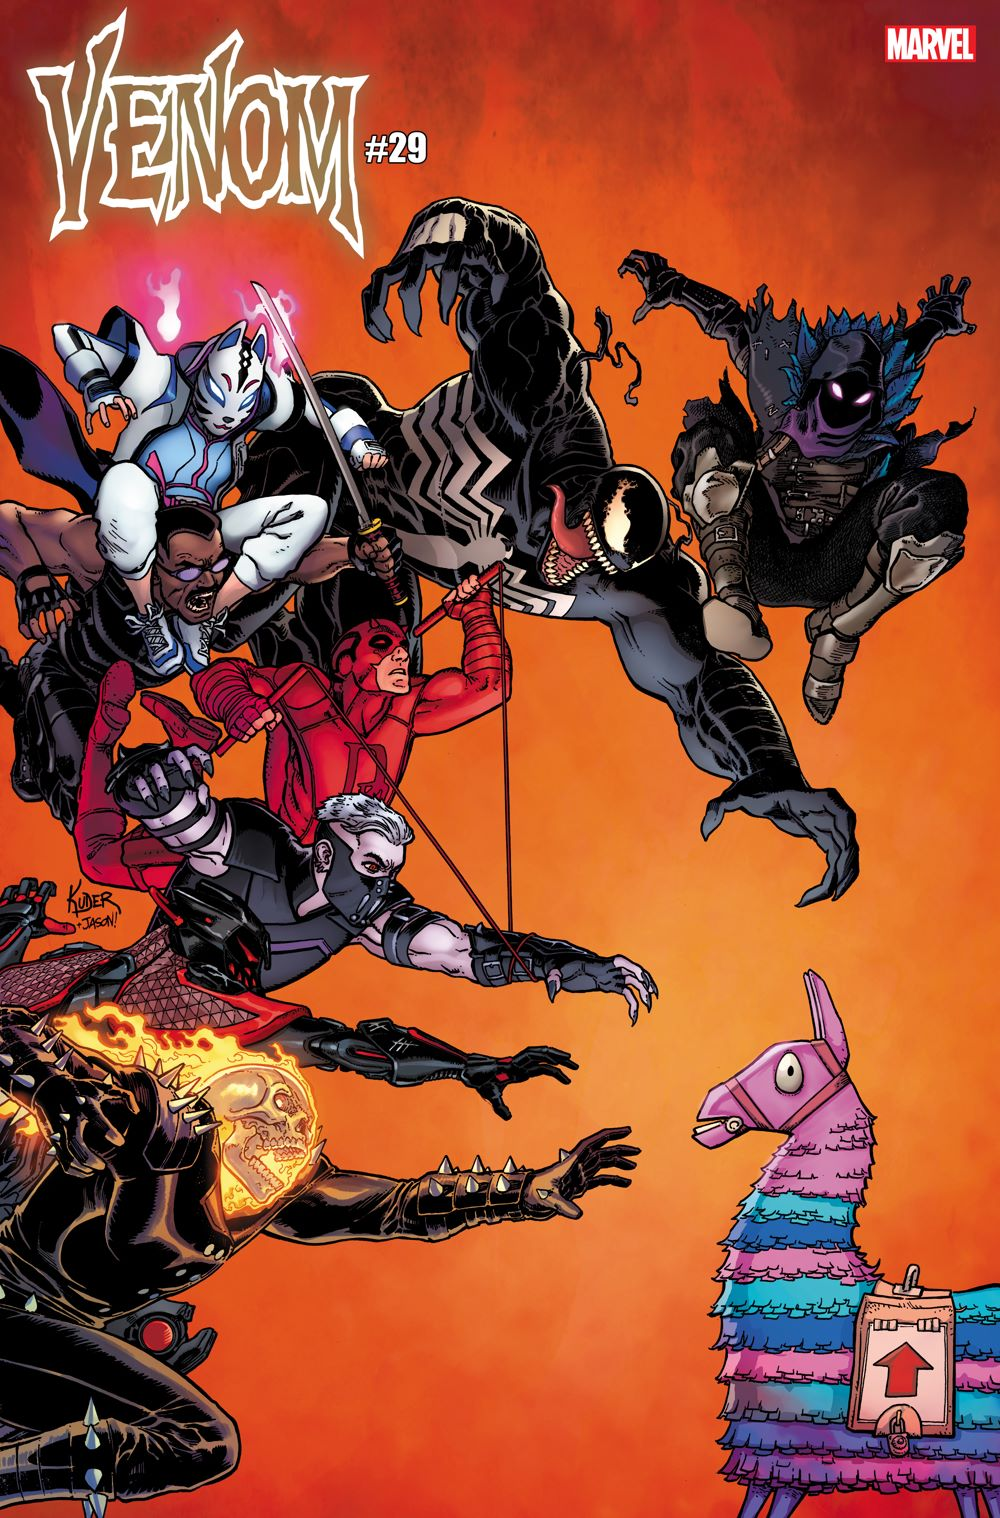 VENOM2018029-Kuder_FortniteVariant Marvel and Fortnite characters unite on special variant covers